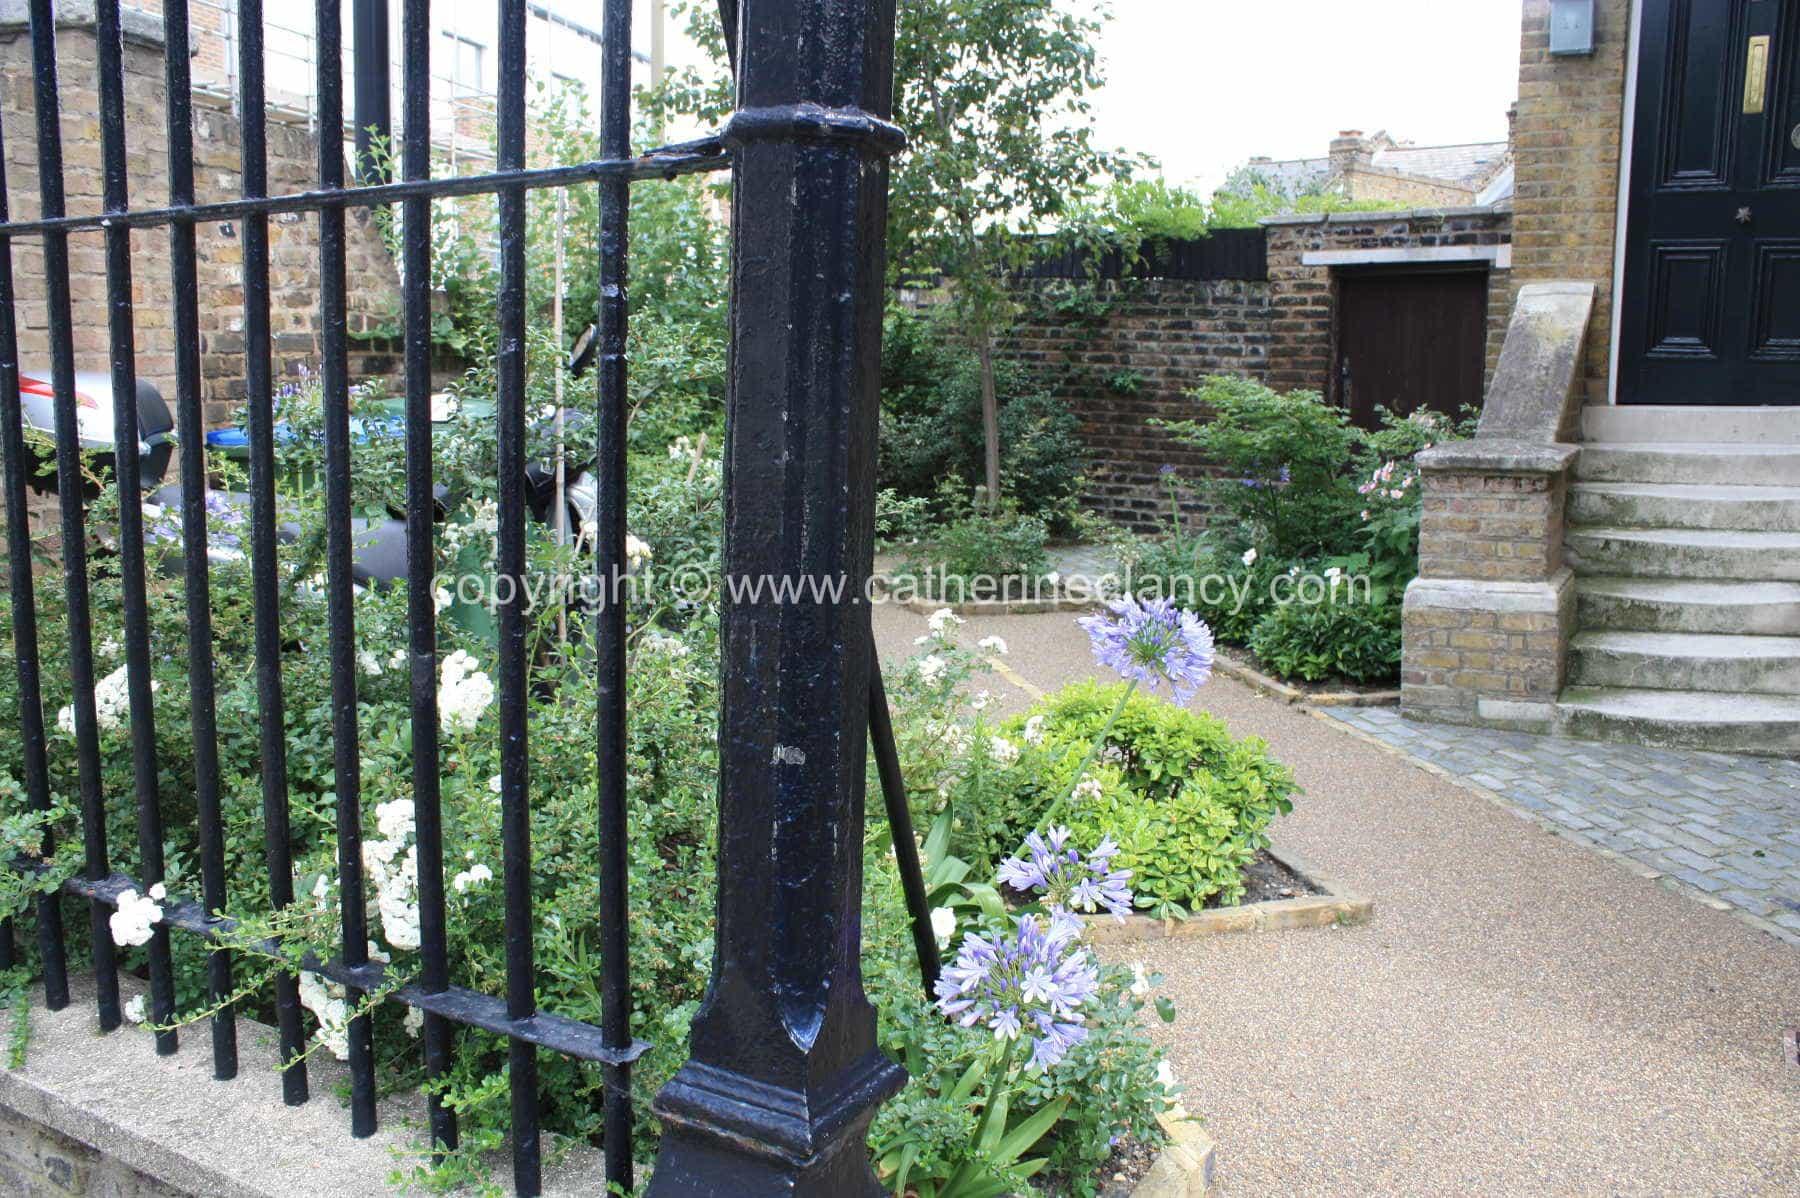 london-courtyard-front-garden-1